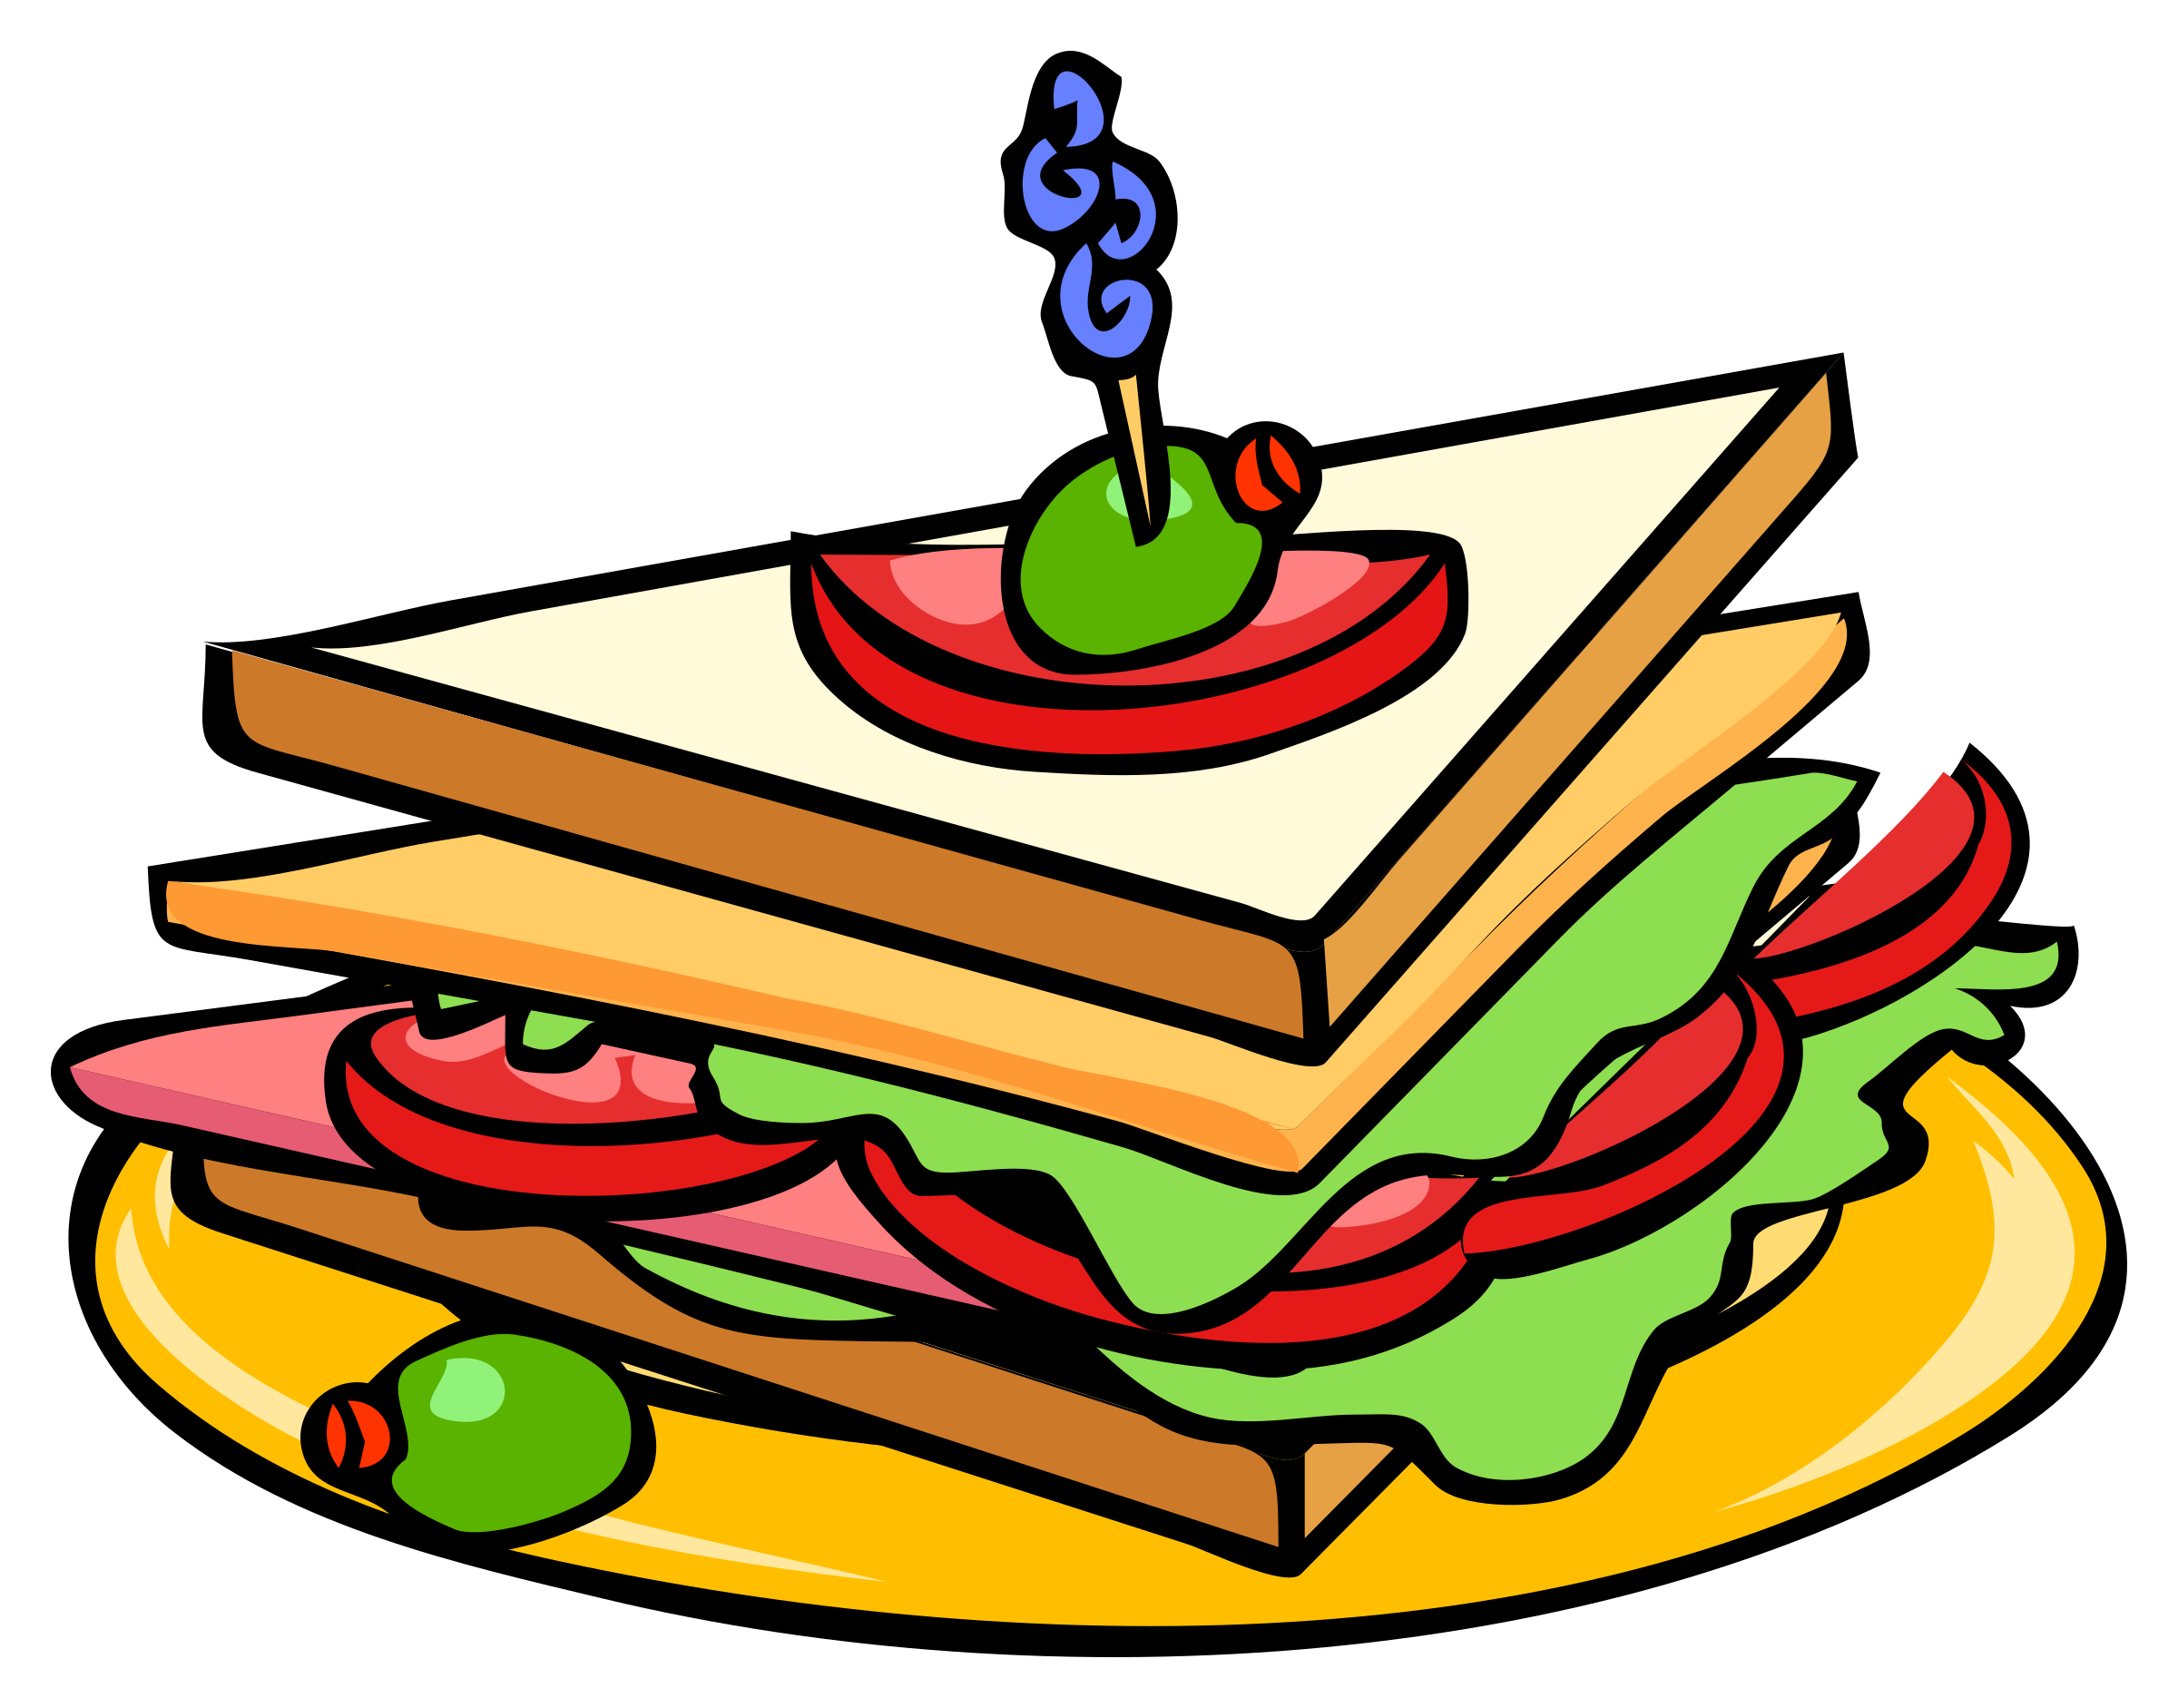 Sliced turkey sandwich clipart jpg library stock Sandwich Clip Art Free | Clipart Panda - Free Clipart Images jpg library stock